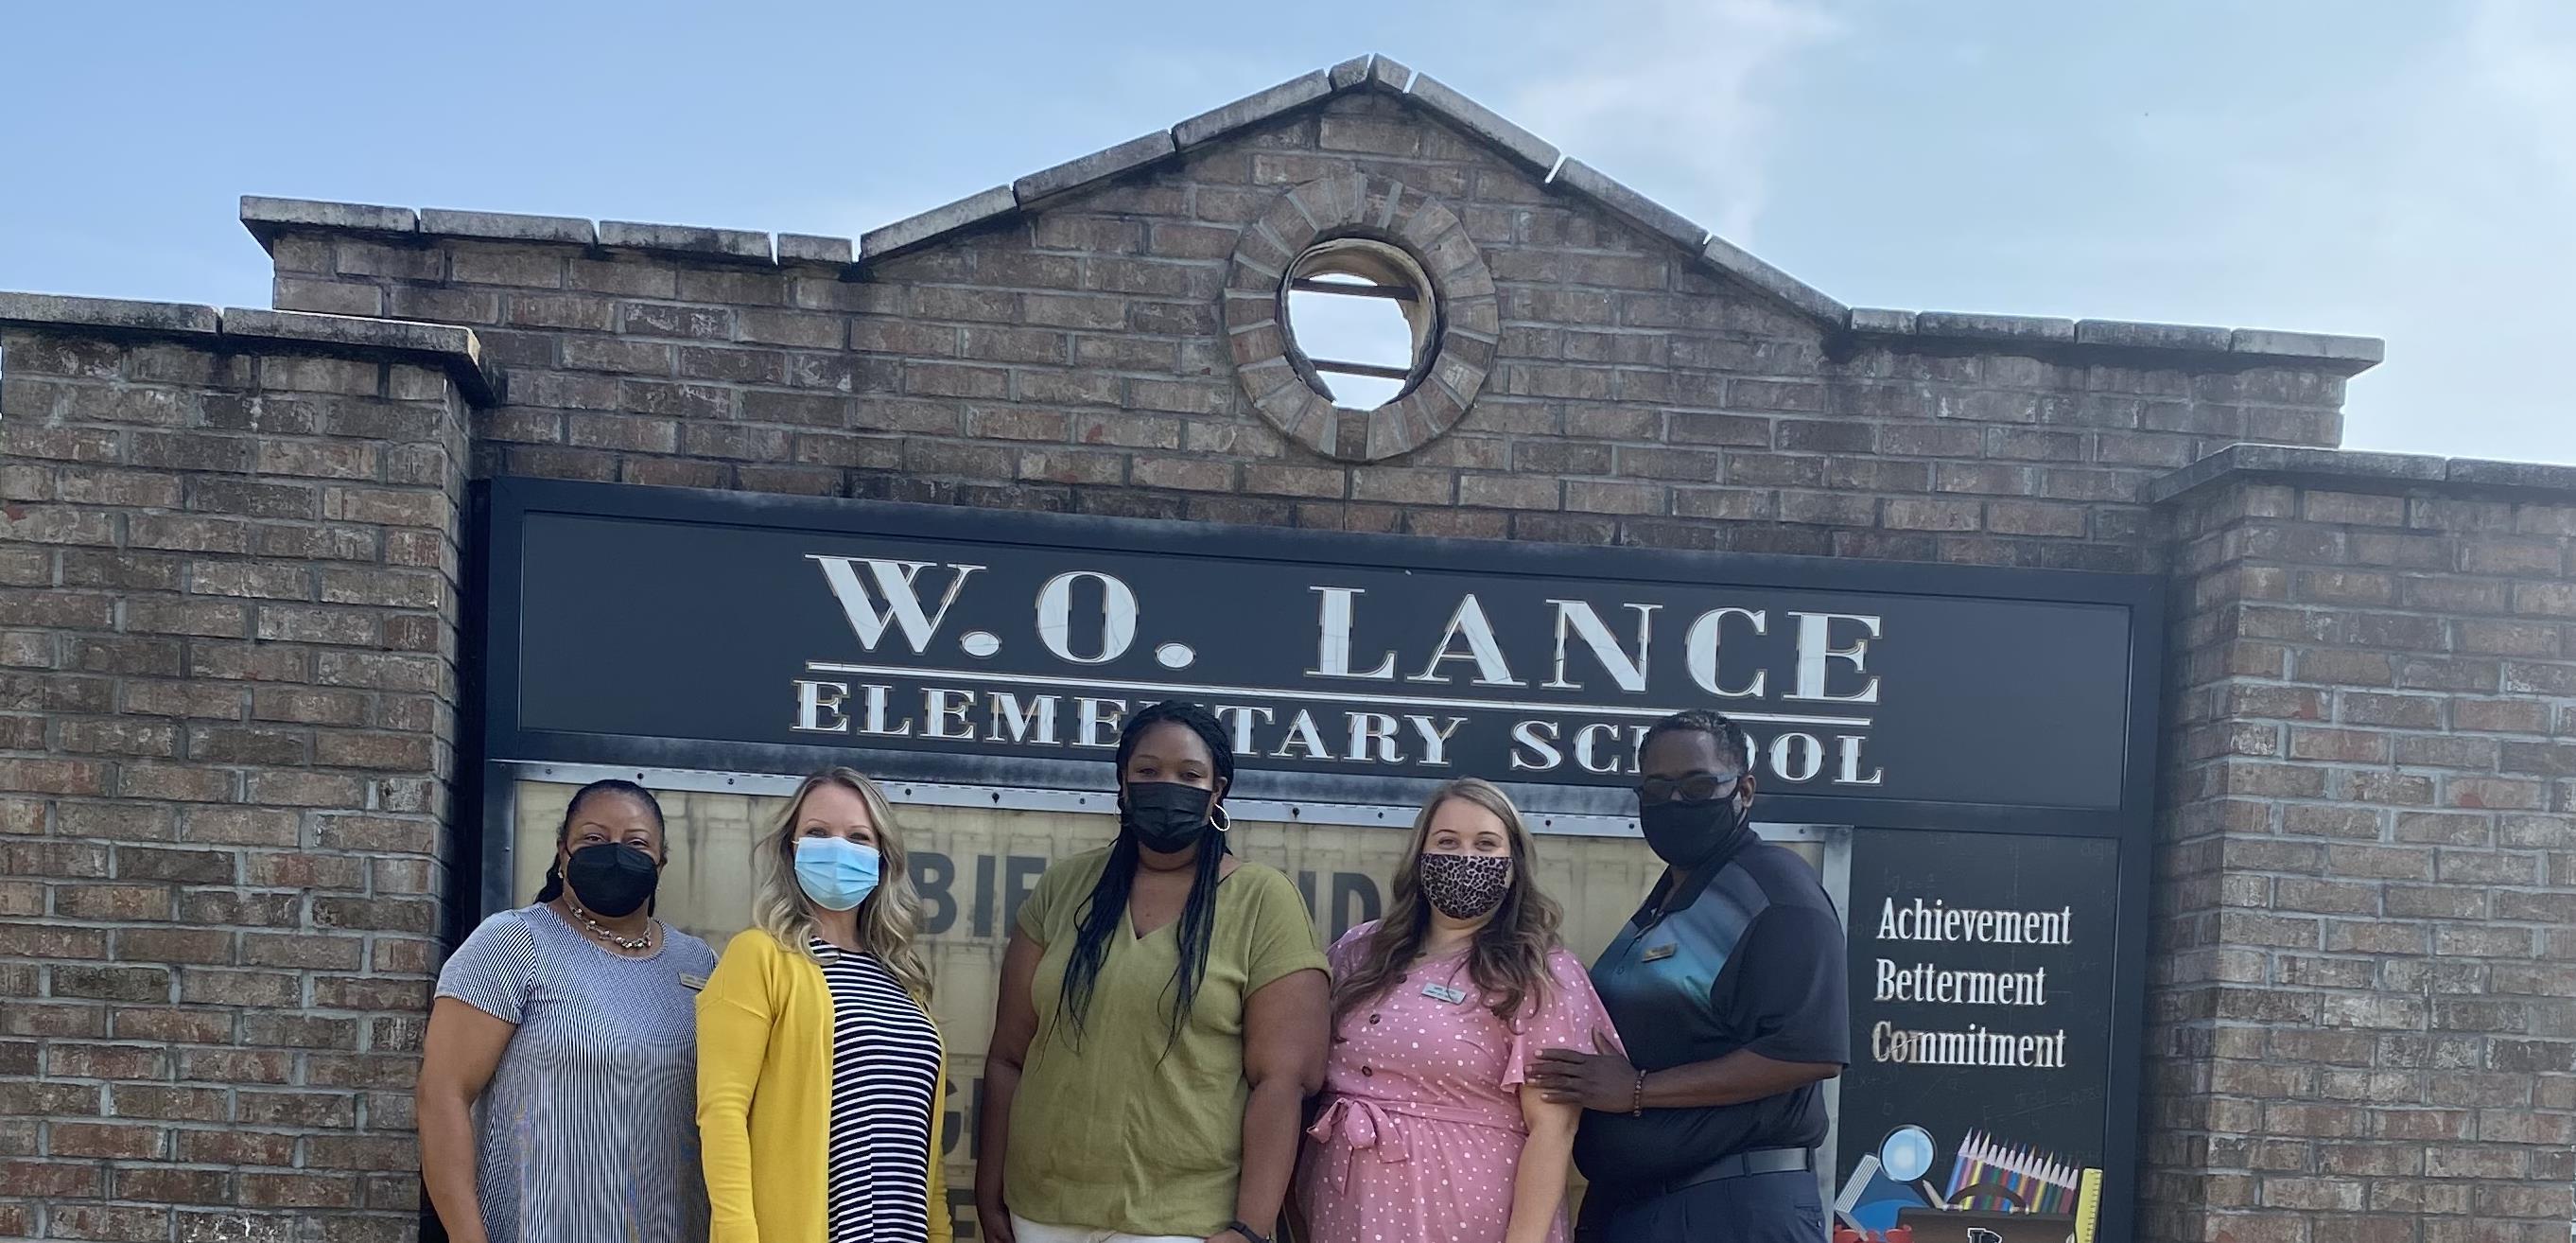 Lance's Office Staff